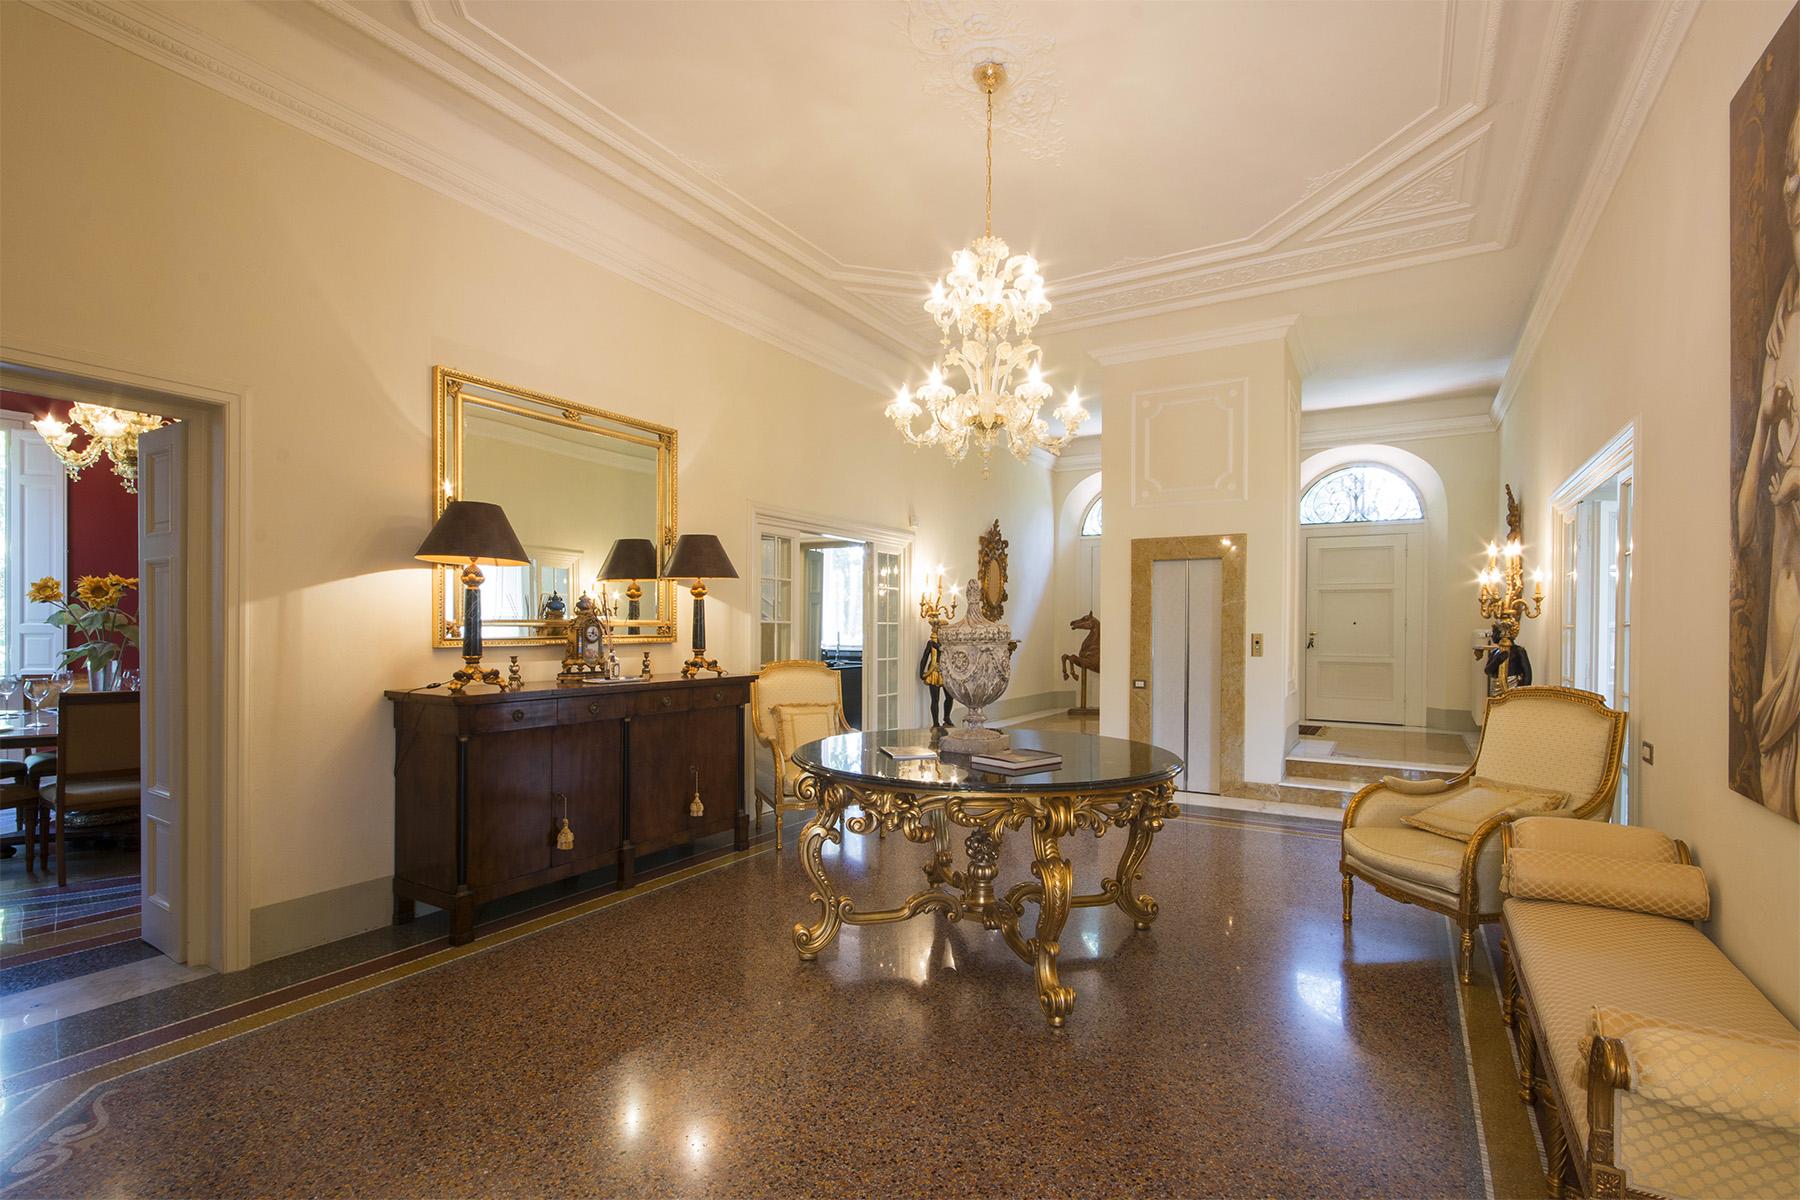 Villa in Vendita a Lucca: 5 locali, 760 mq - Foto 8